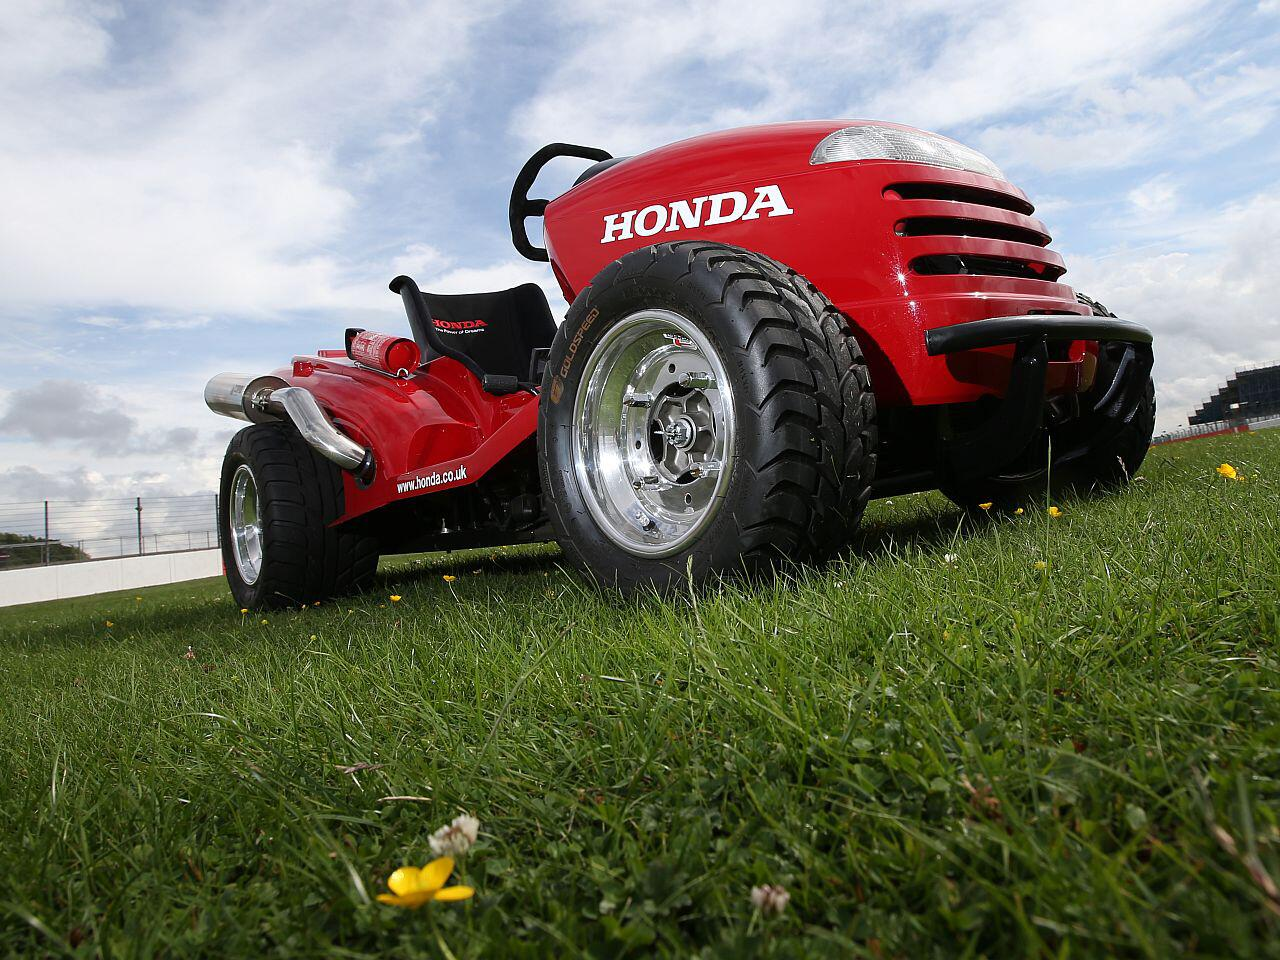 "Bild zu Umgebauter Rasenmäher: Honda ""Mean Mower"""